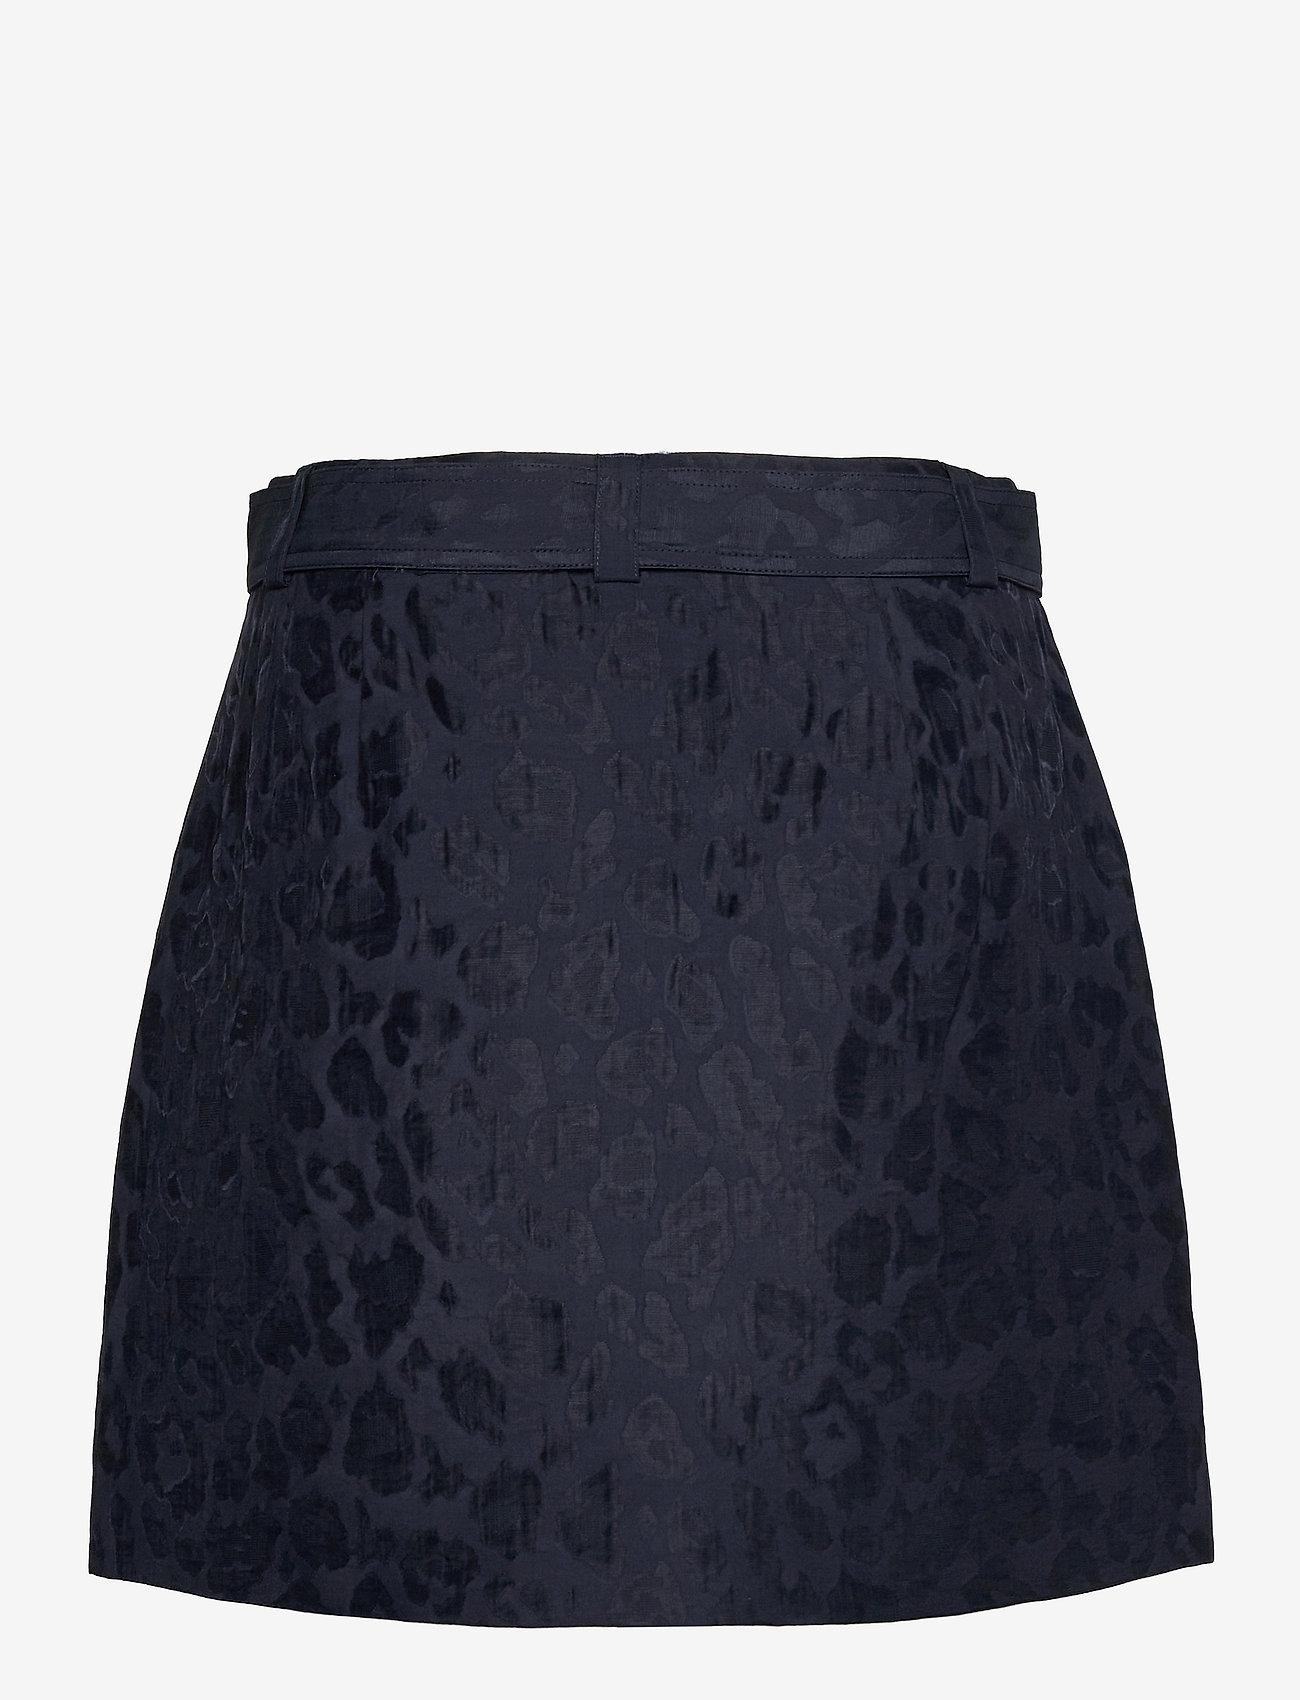 Scotch & Soda - Wrap-over skirt in animal jacquard Tencel™ quality - omlottkjolar - night - 1